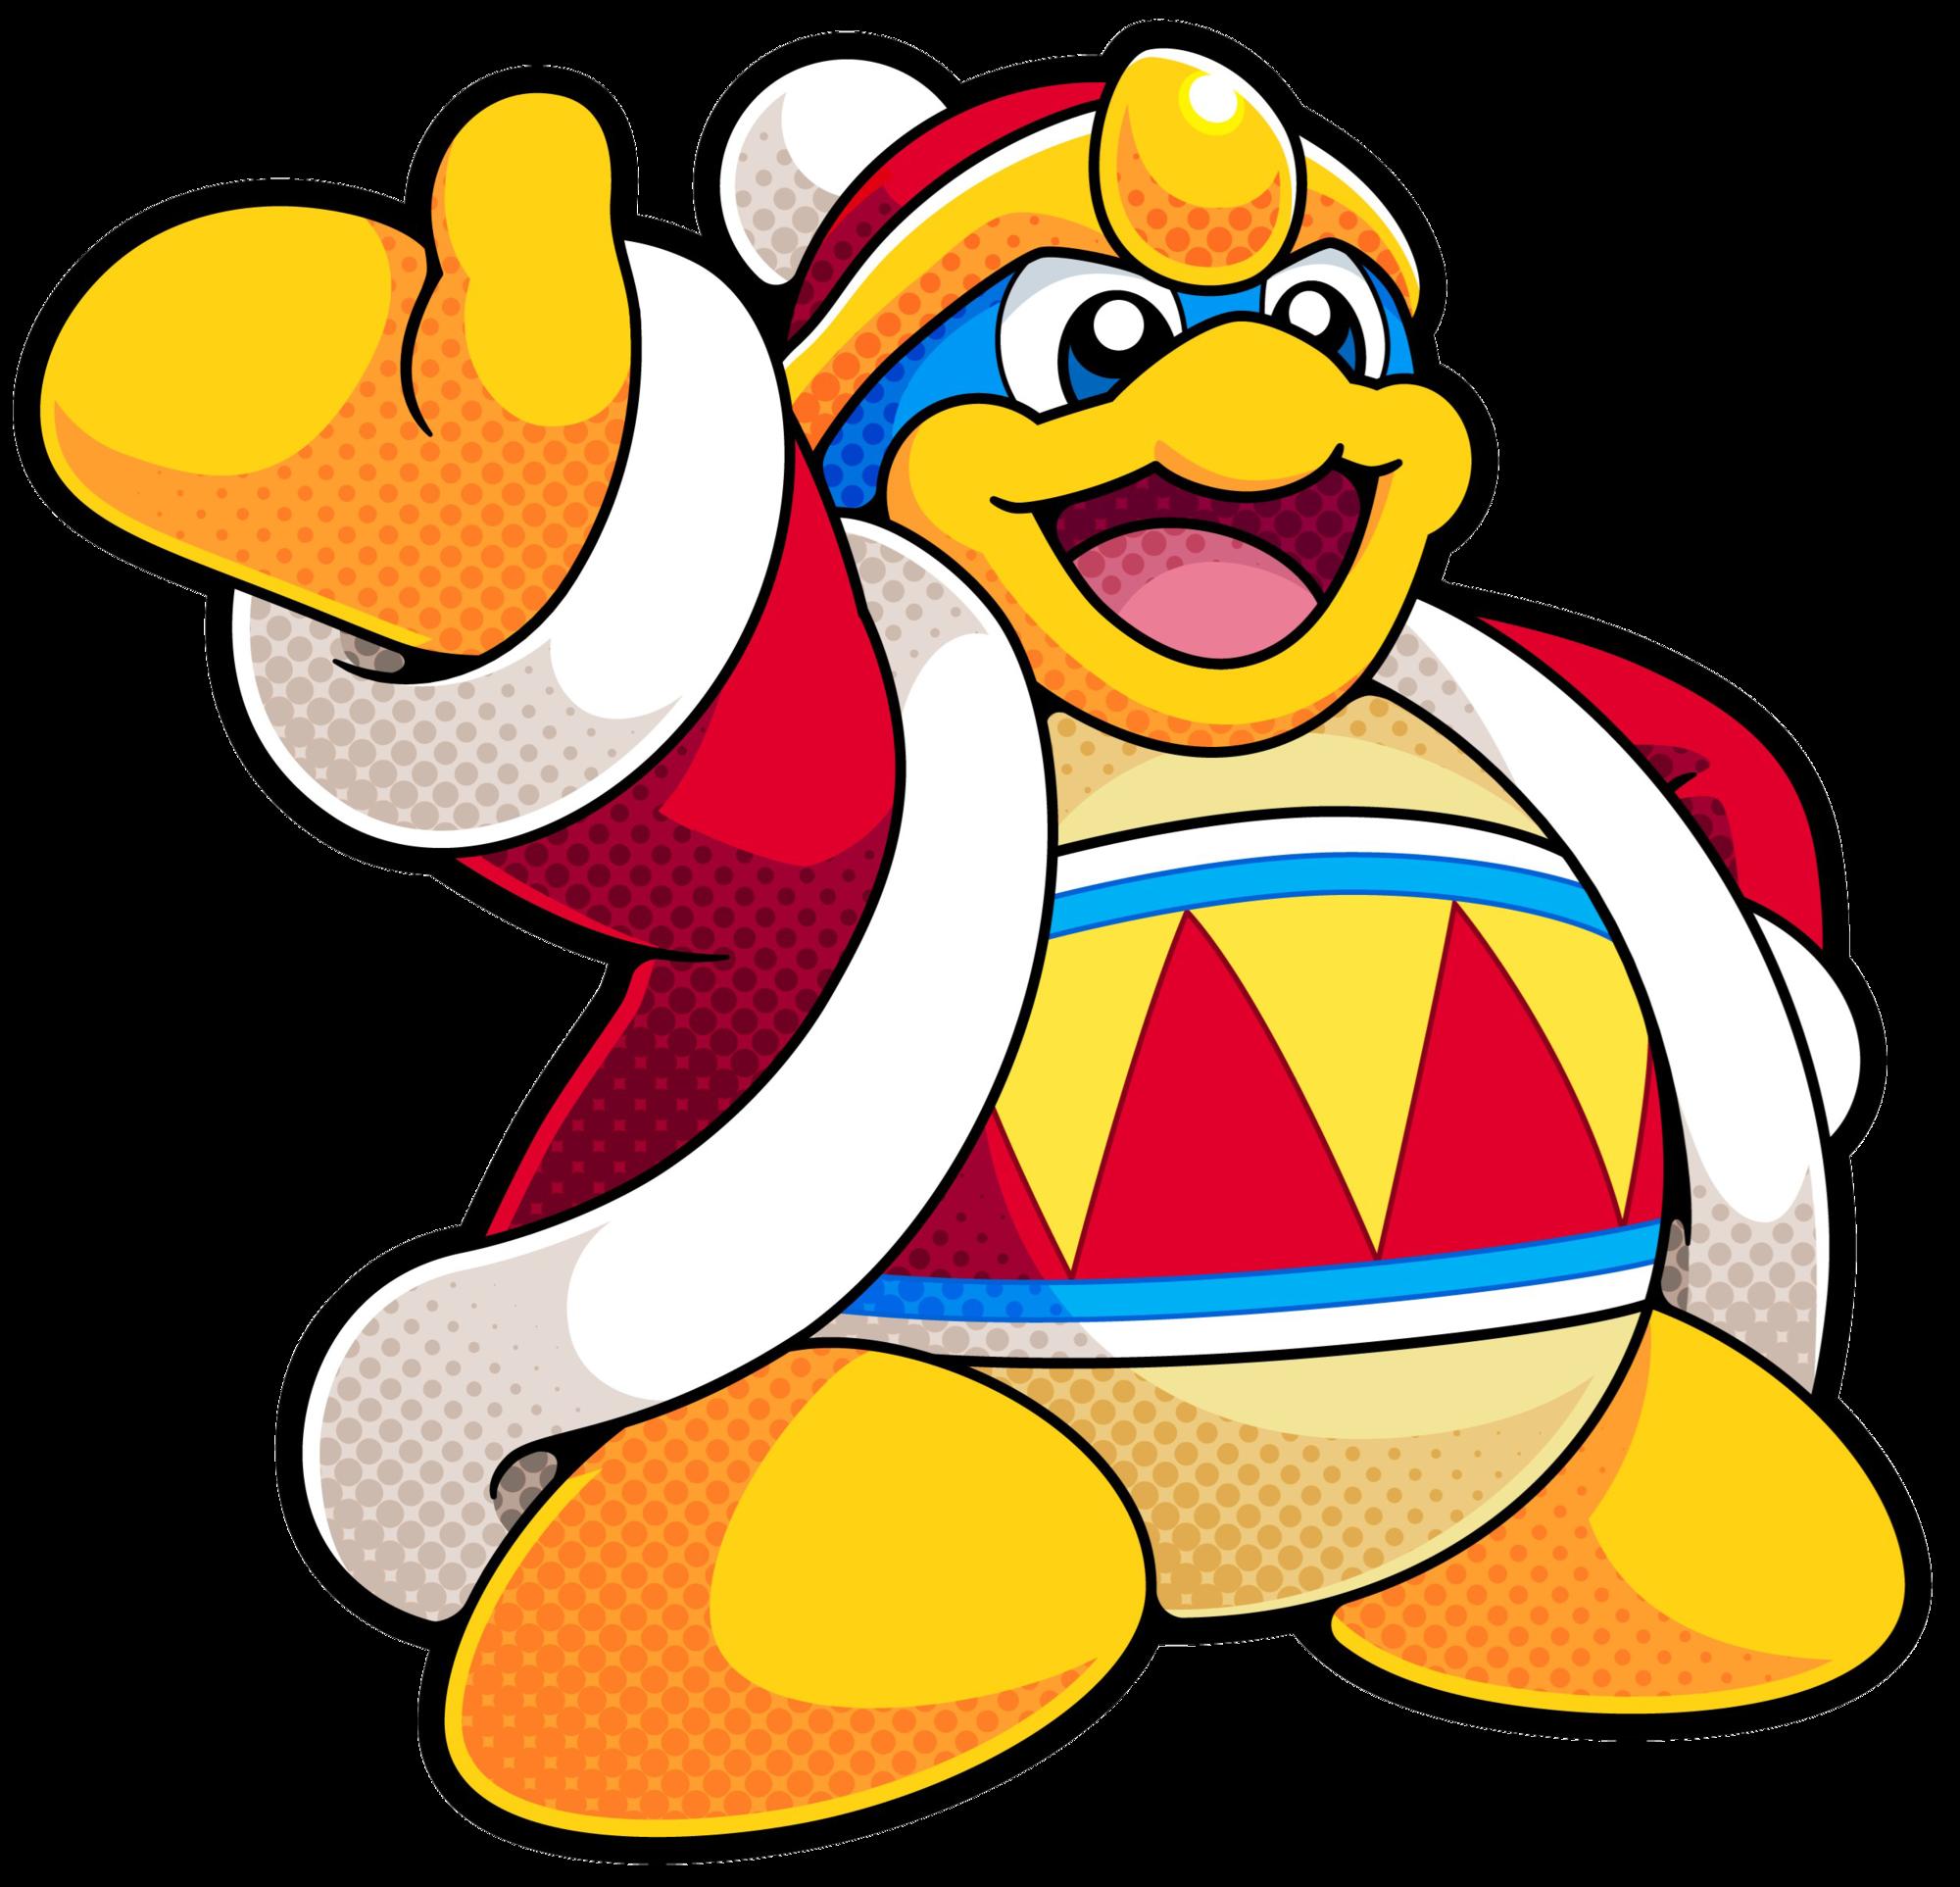 King dedede characterrealms wiki. Clipart explosion shockwave